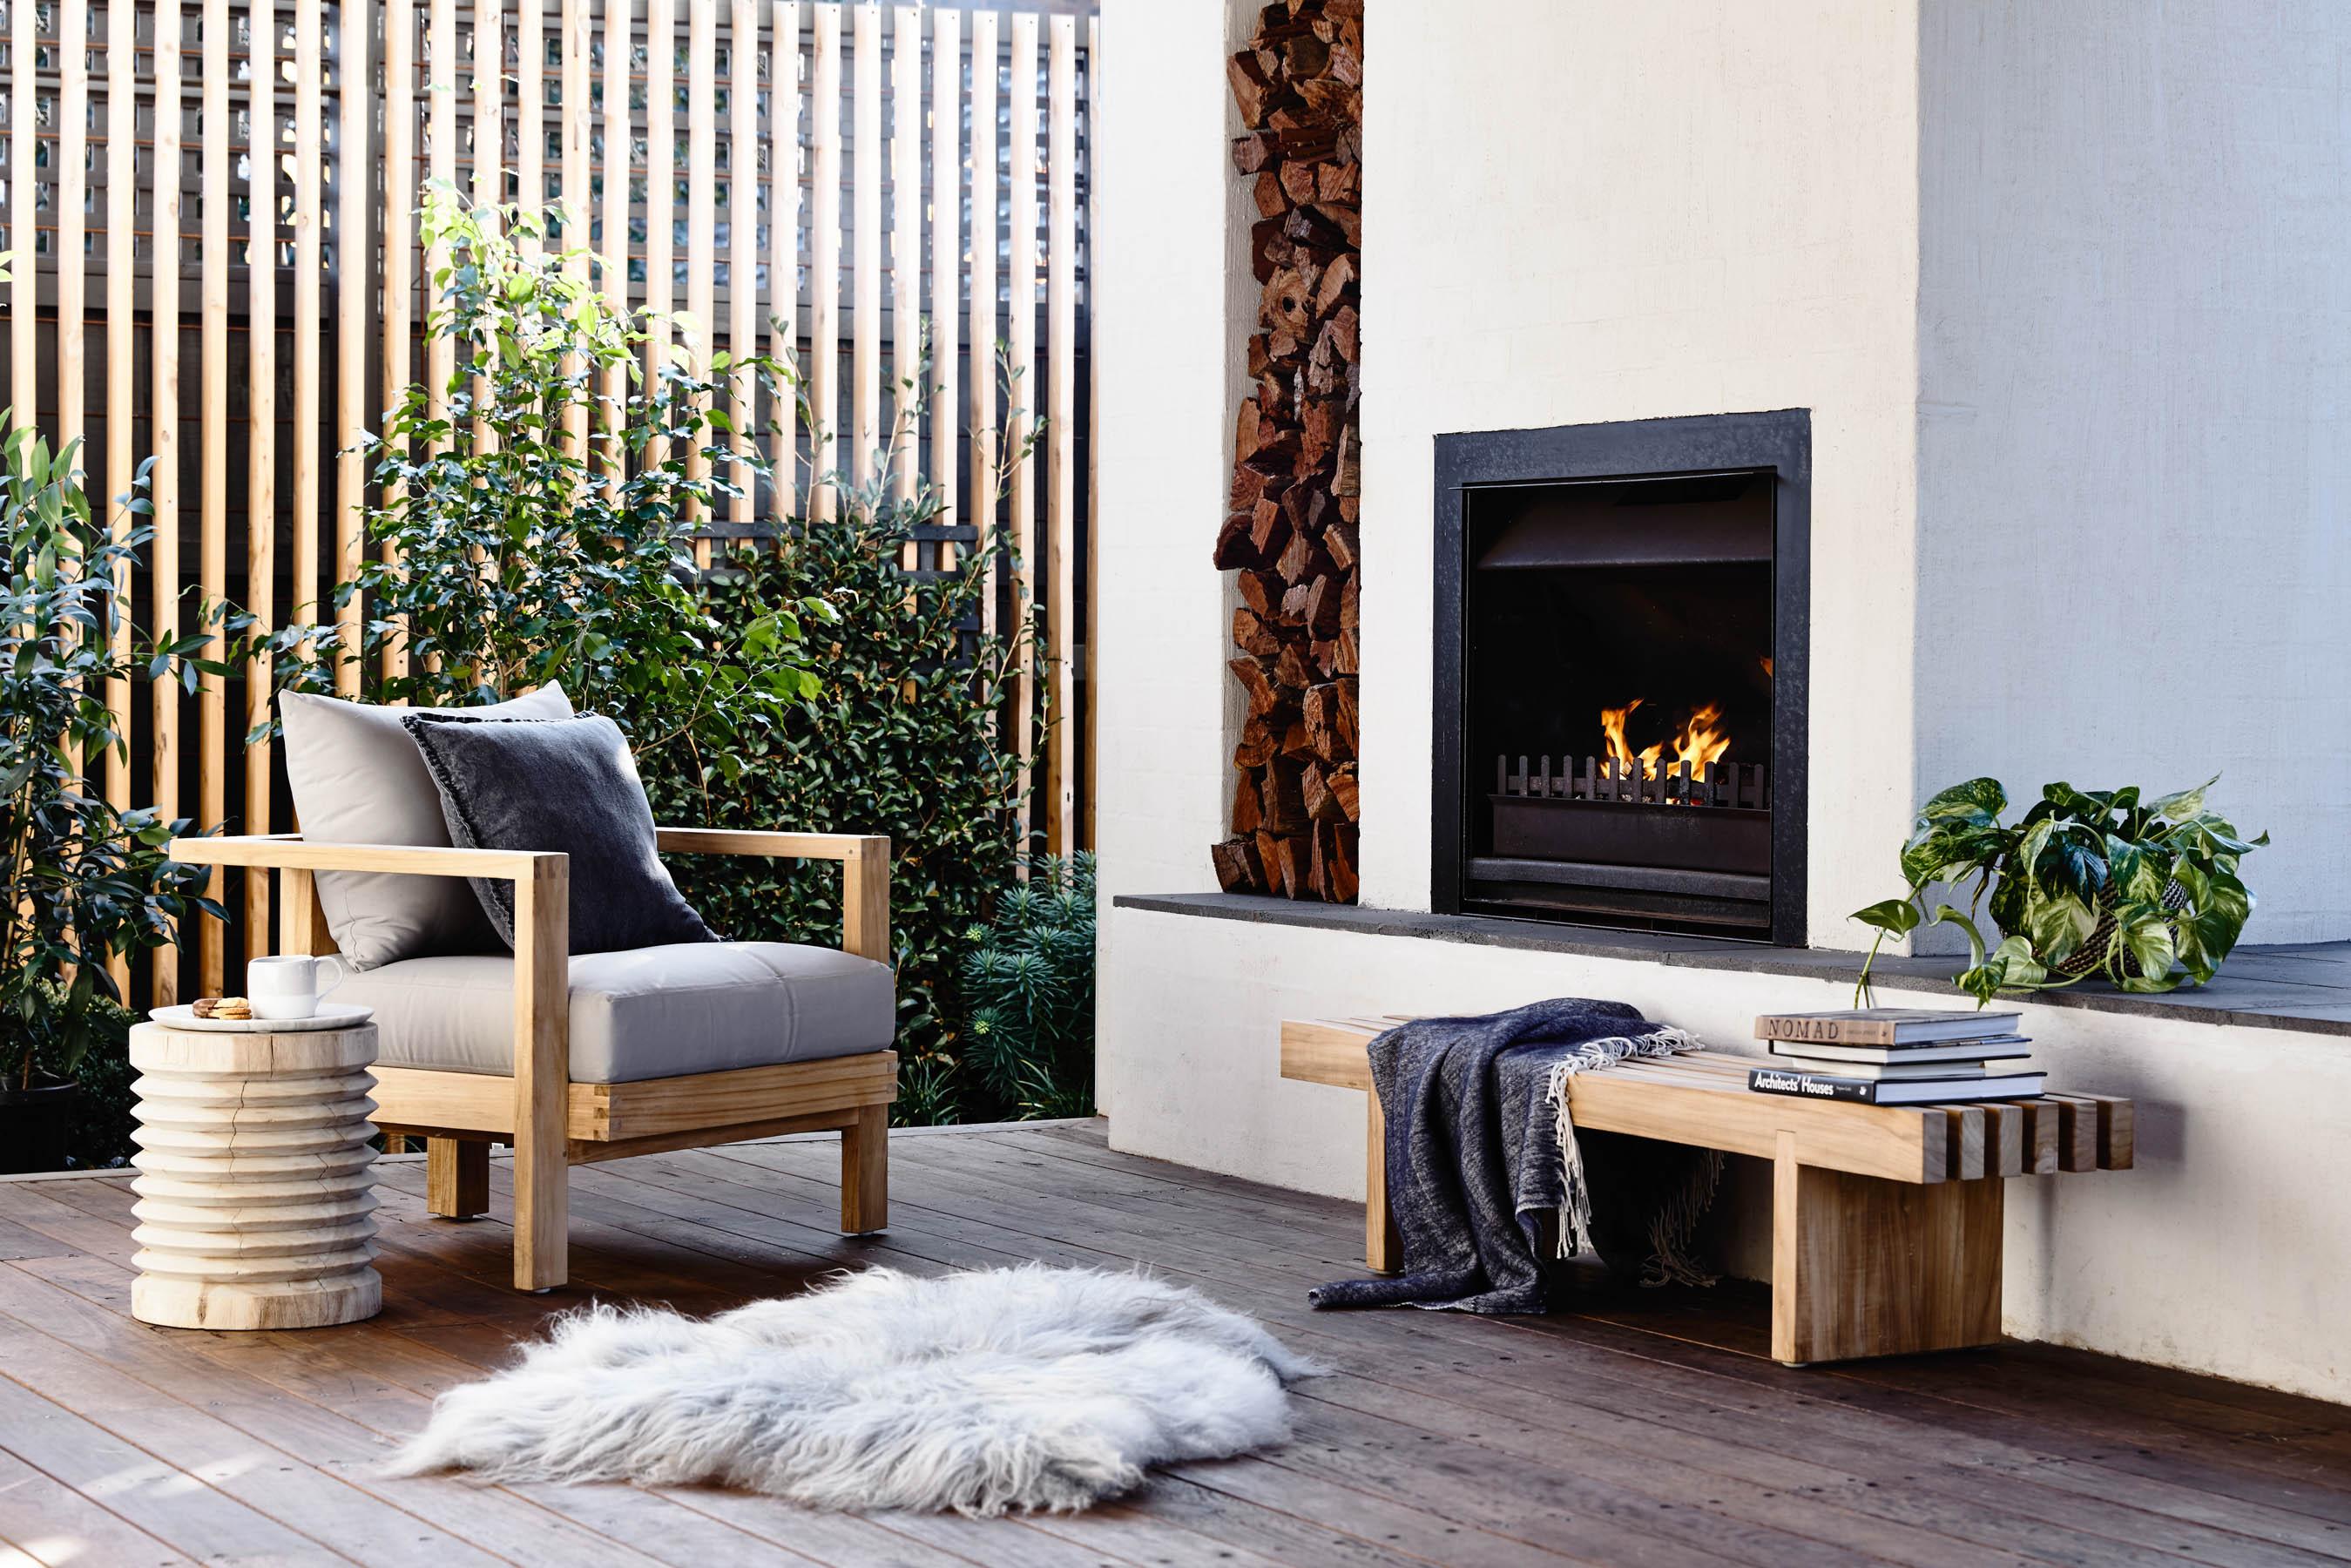 Furniture Gallery Sofas sonoma-one-seater-sofa-02